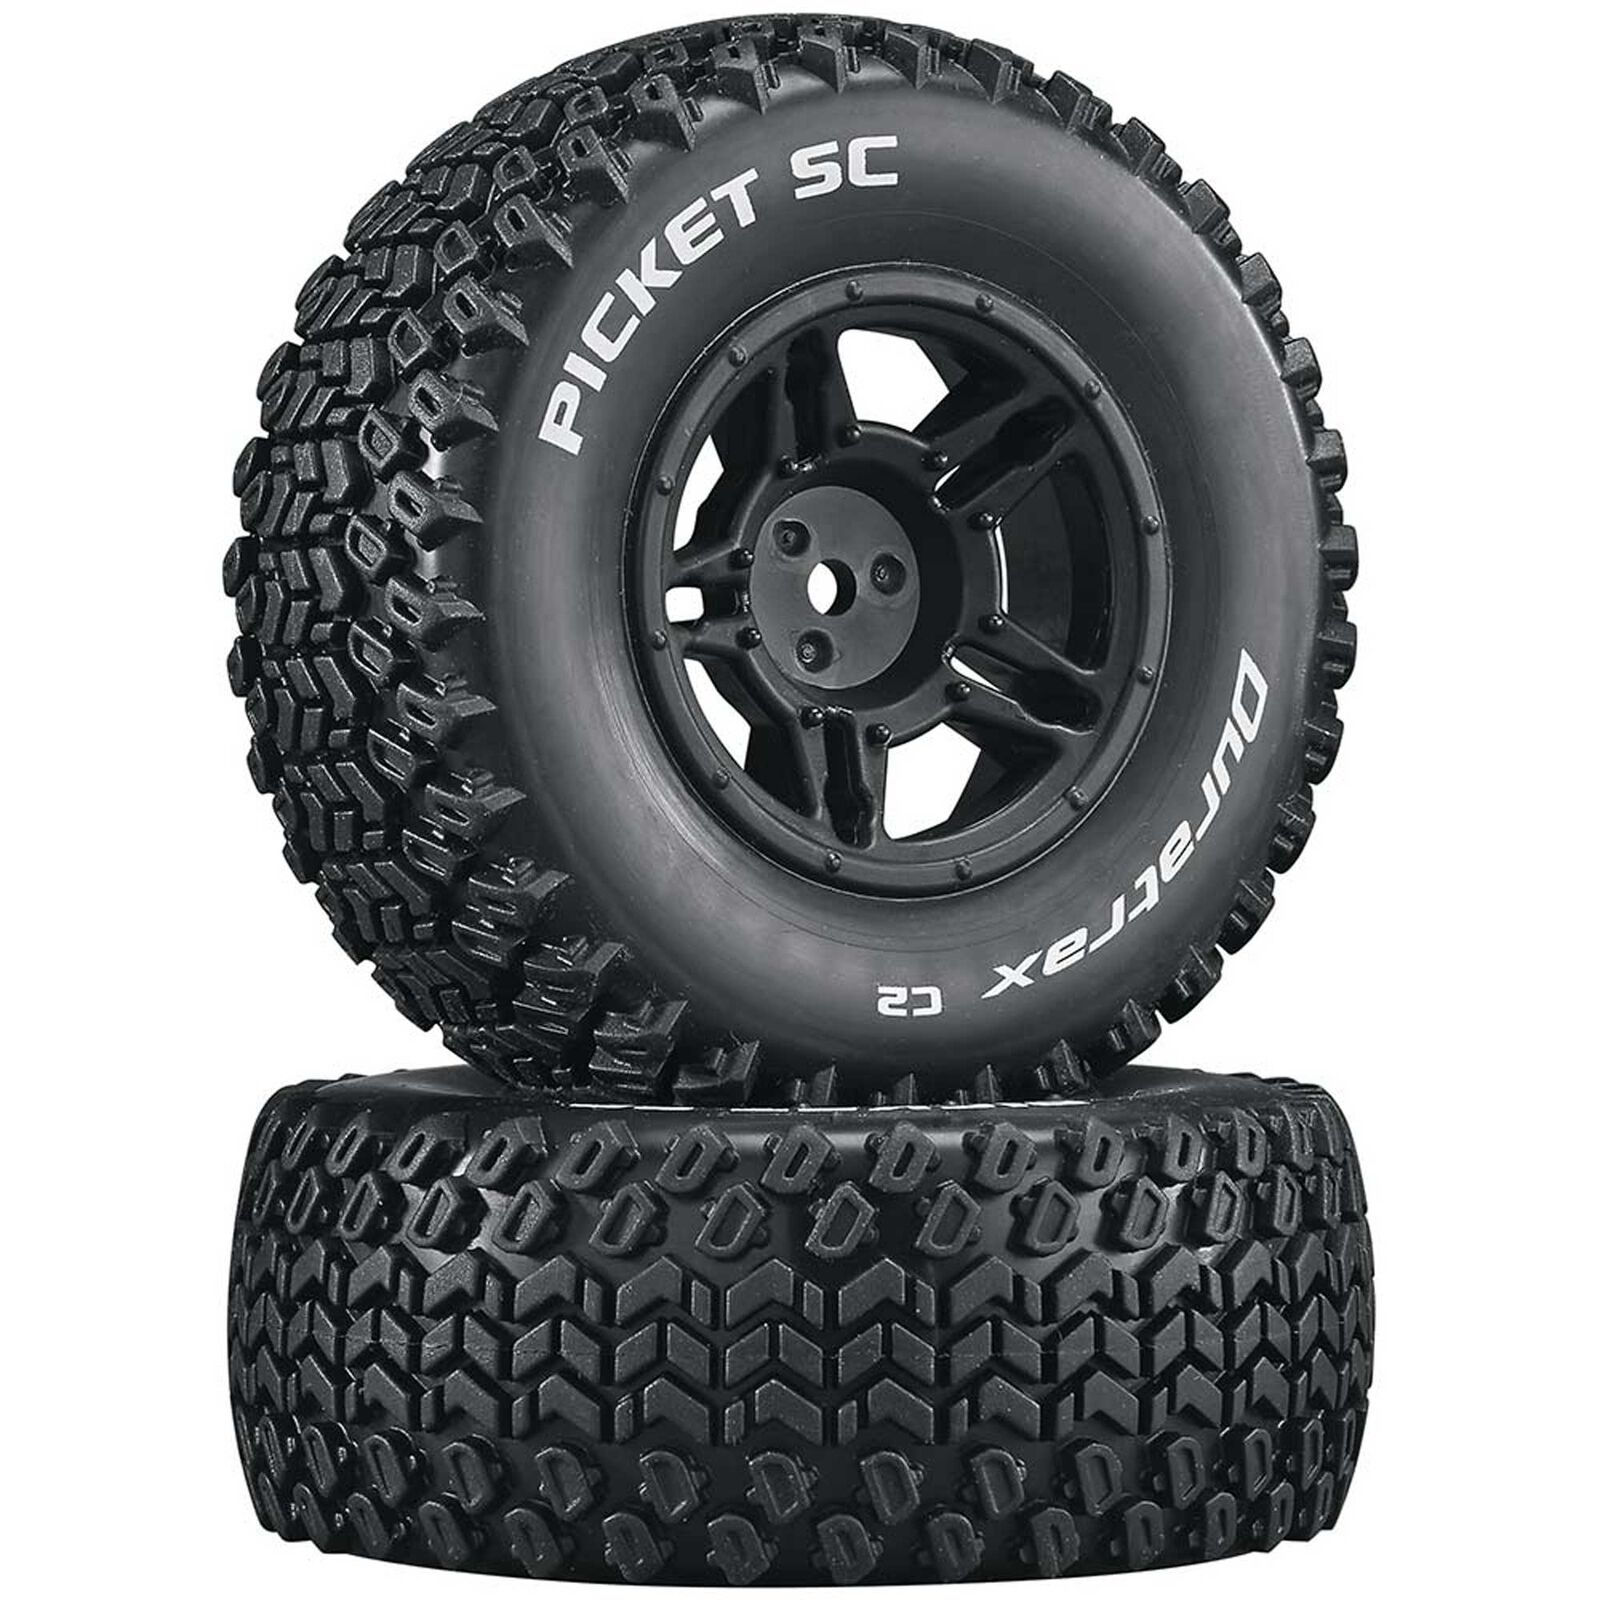 Picket SC C2 Mounted Tires: Slash 4x4 Blitz Front Rear (2)